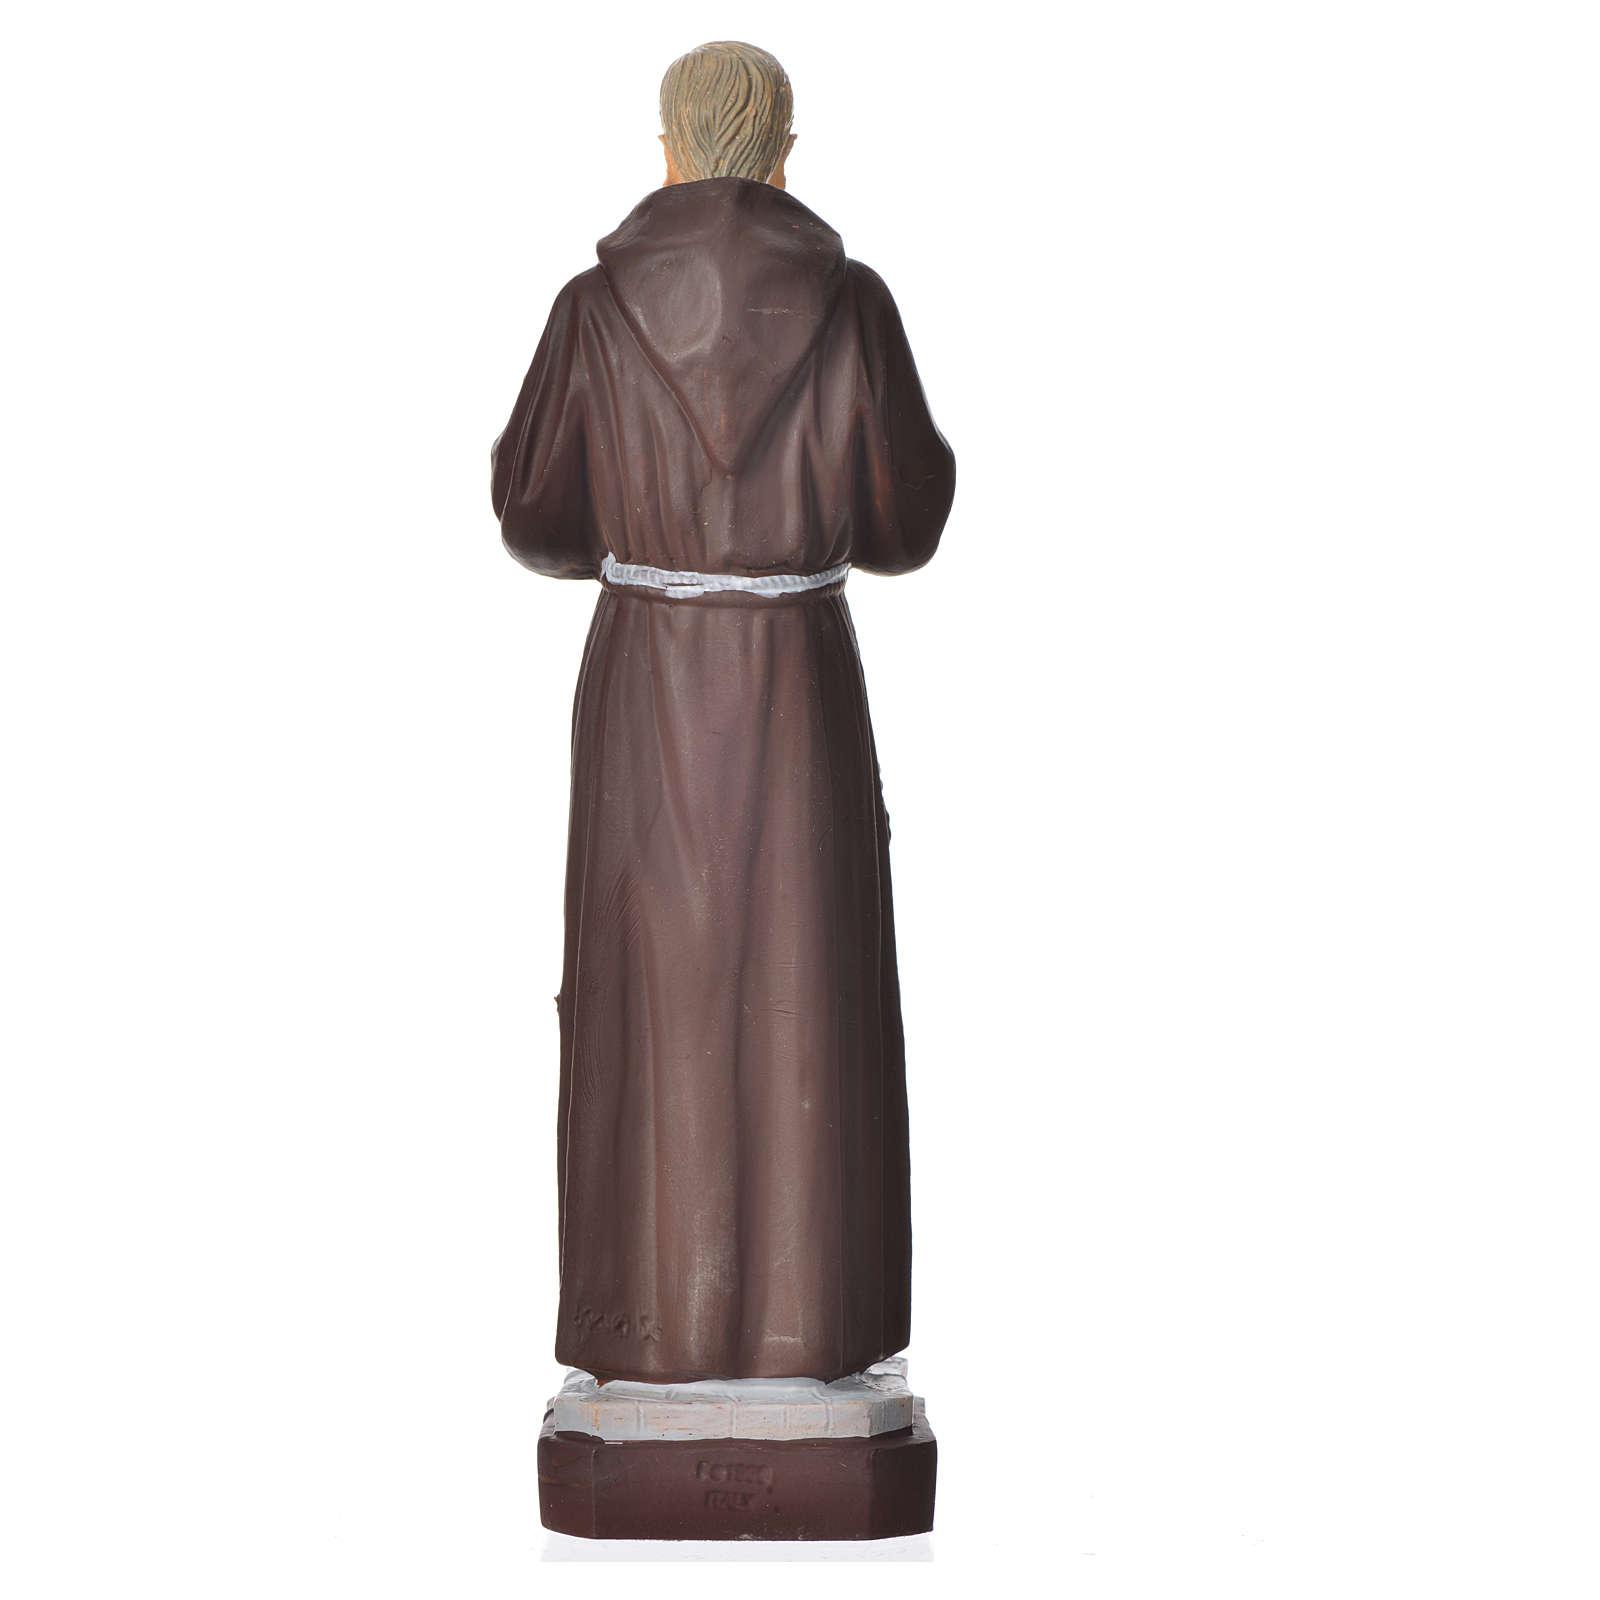 Padre Pio 16cm, unbreakable material 4